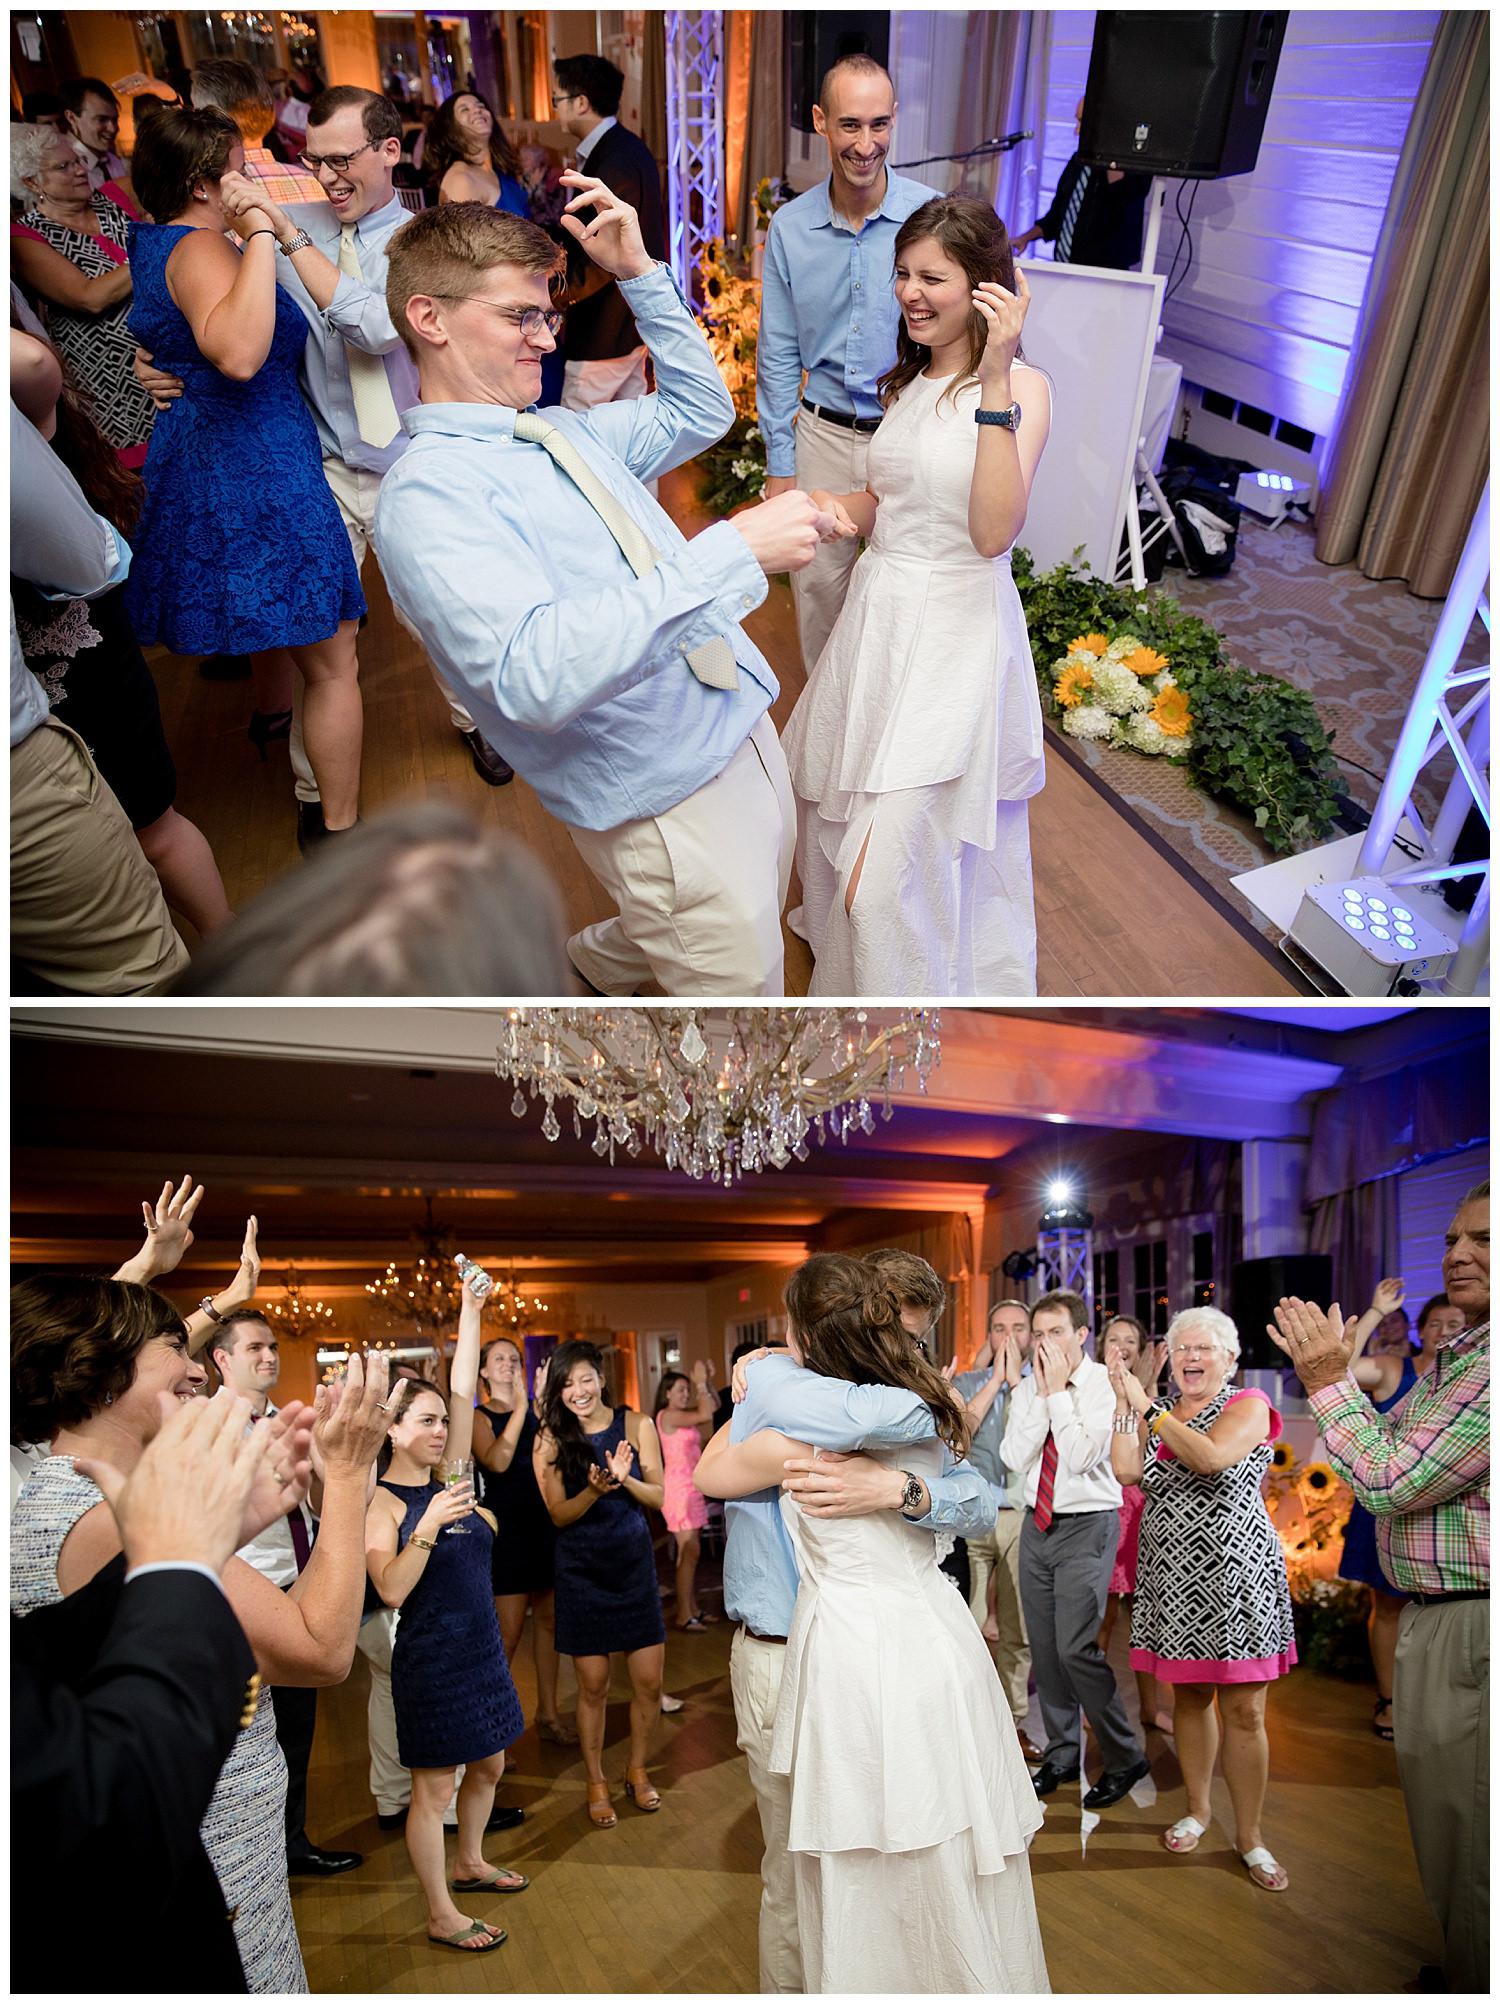 pine-brook-country-club-wedding-26-north-studios-30